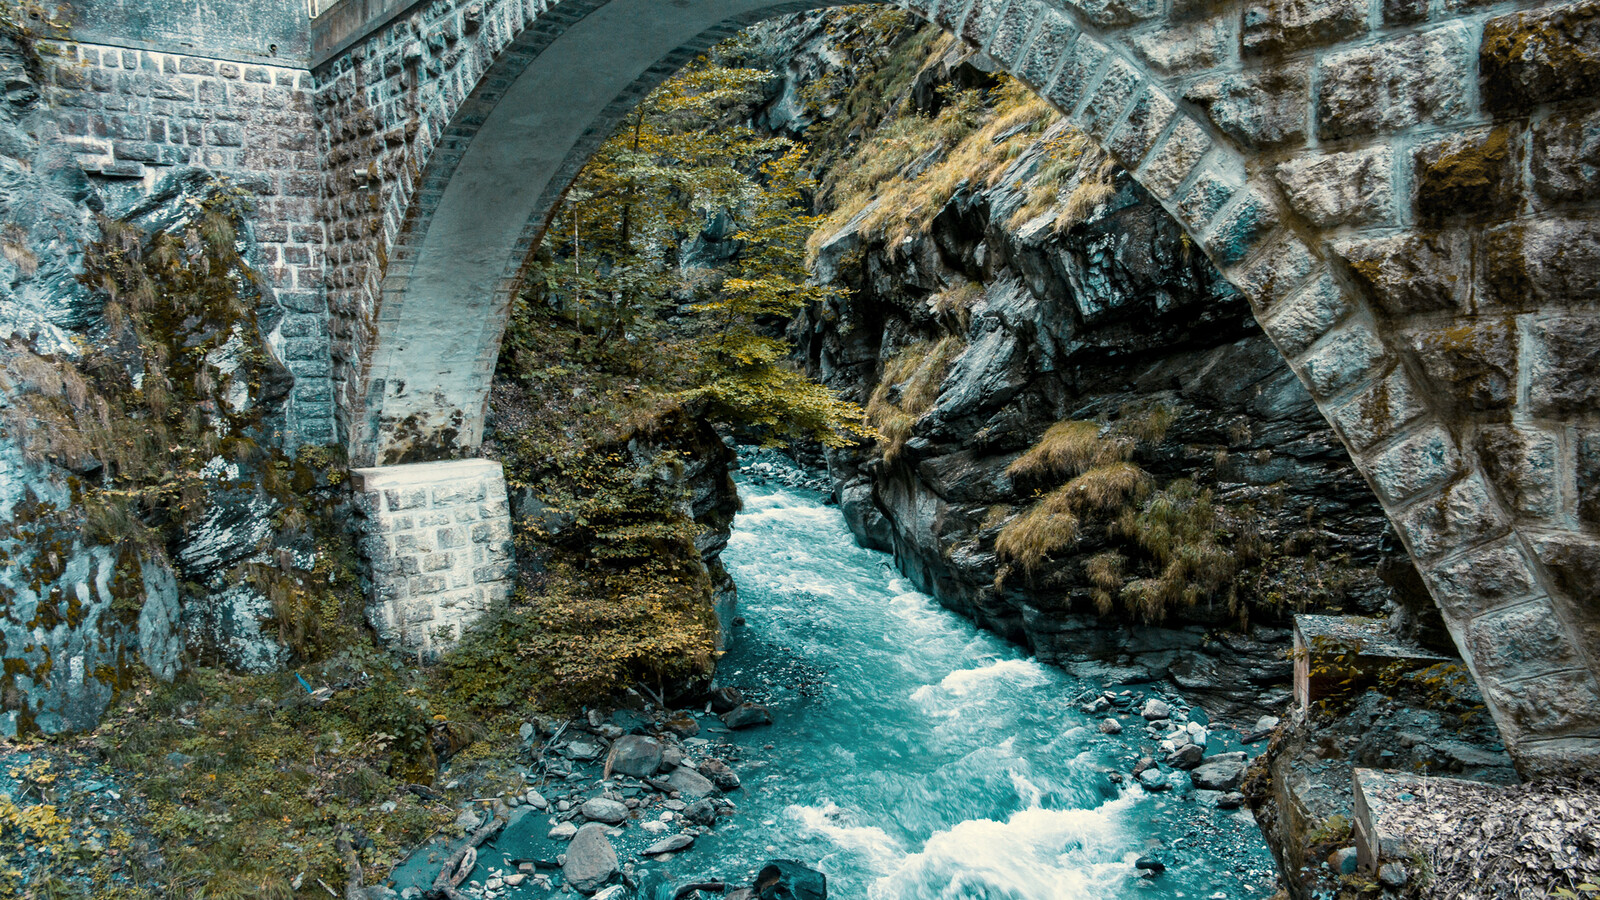 Bad Ragaz bridge